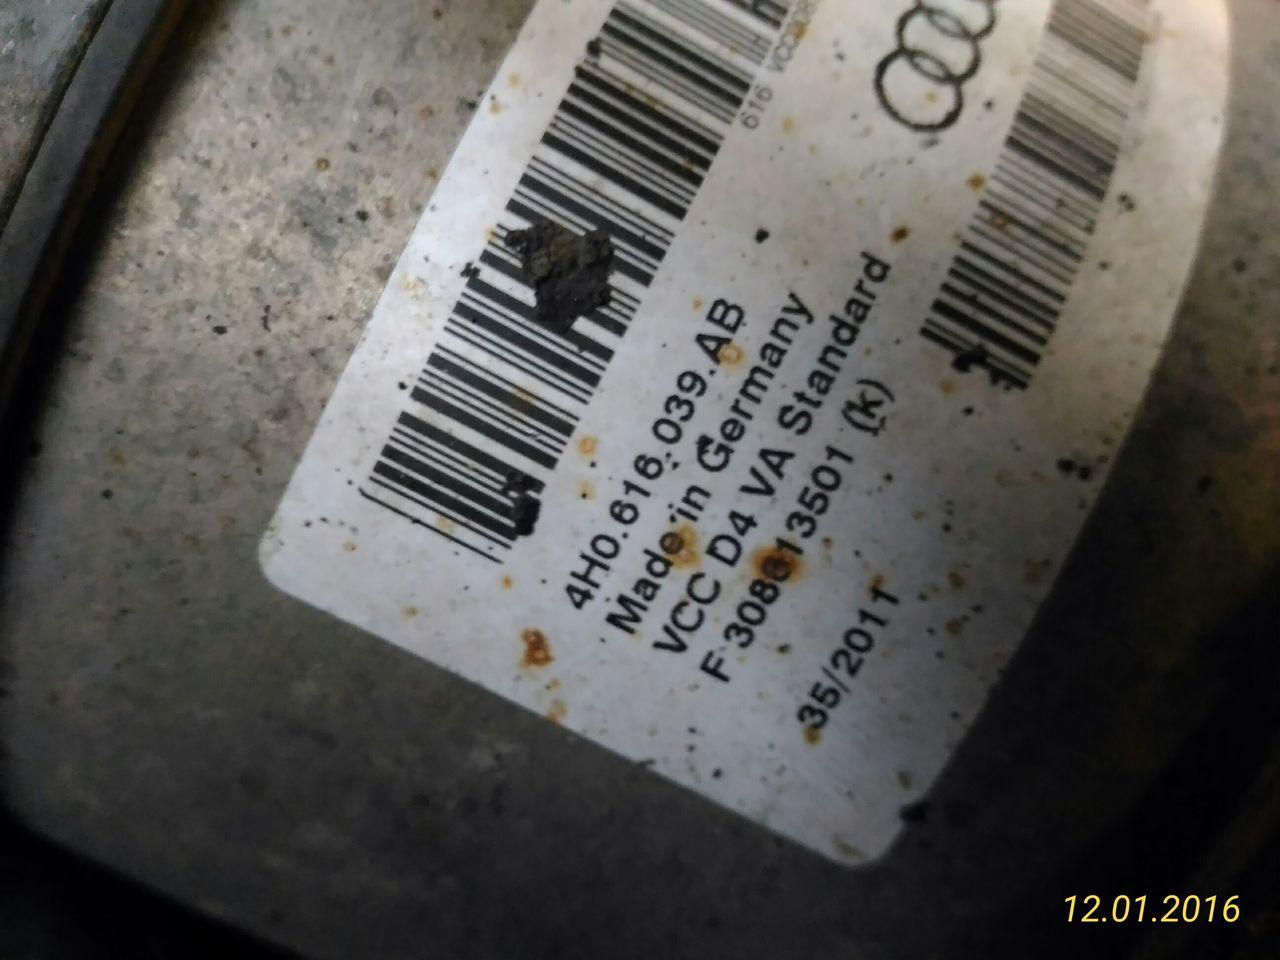 Amortizor pneumatic Audi A8 4H D4 2009-2015